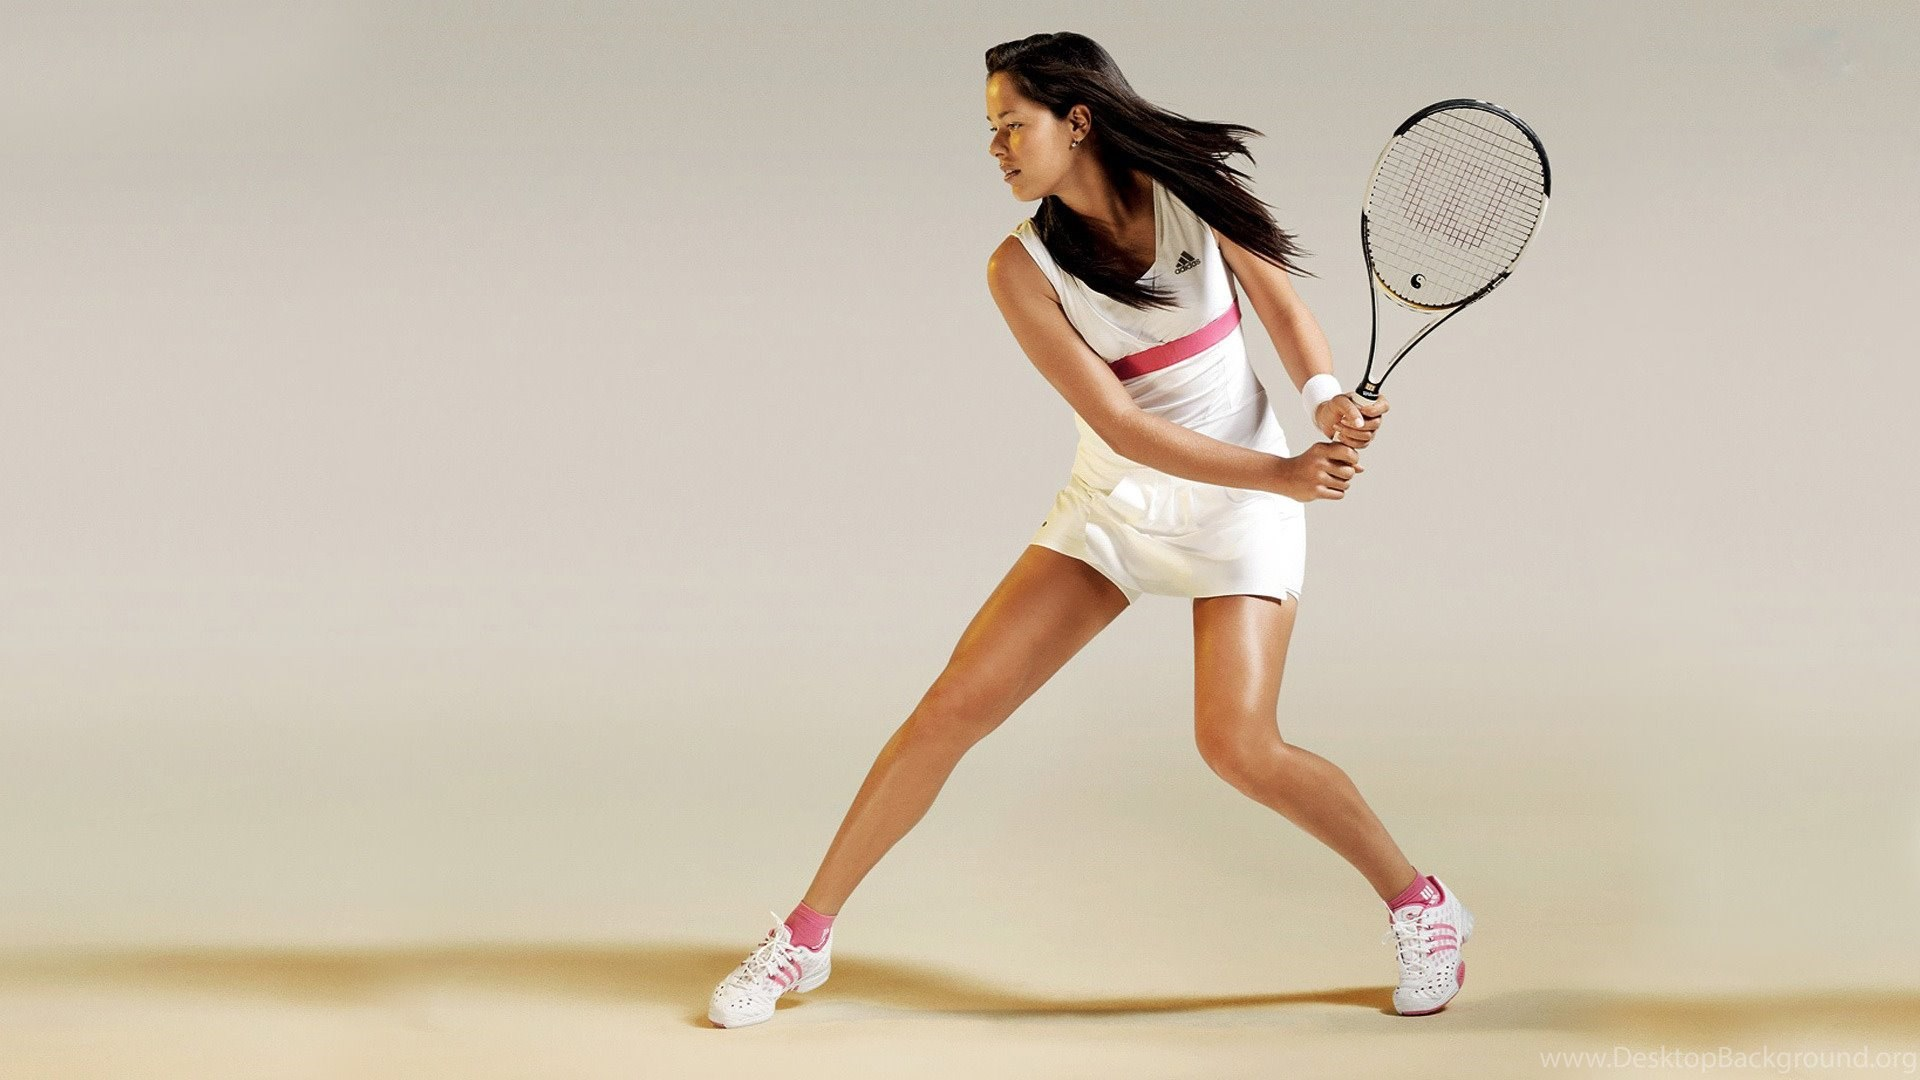 womens div mini tennis - HD1440×900